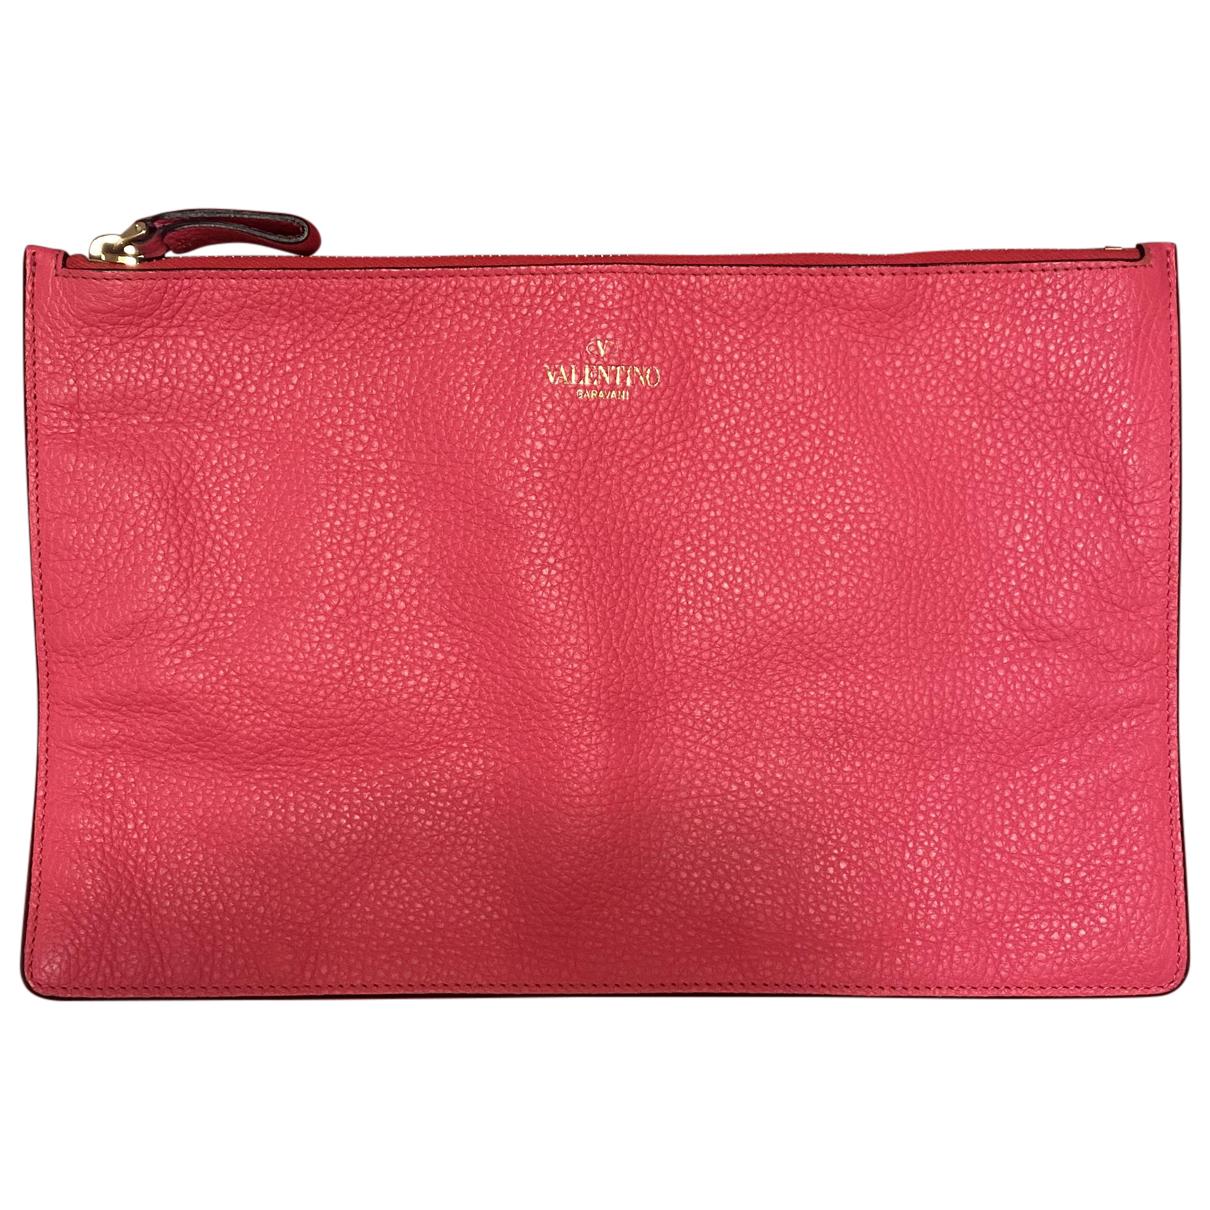 Valentino Garavani N Pink Leather Clutch bag for Women N